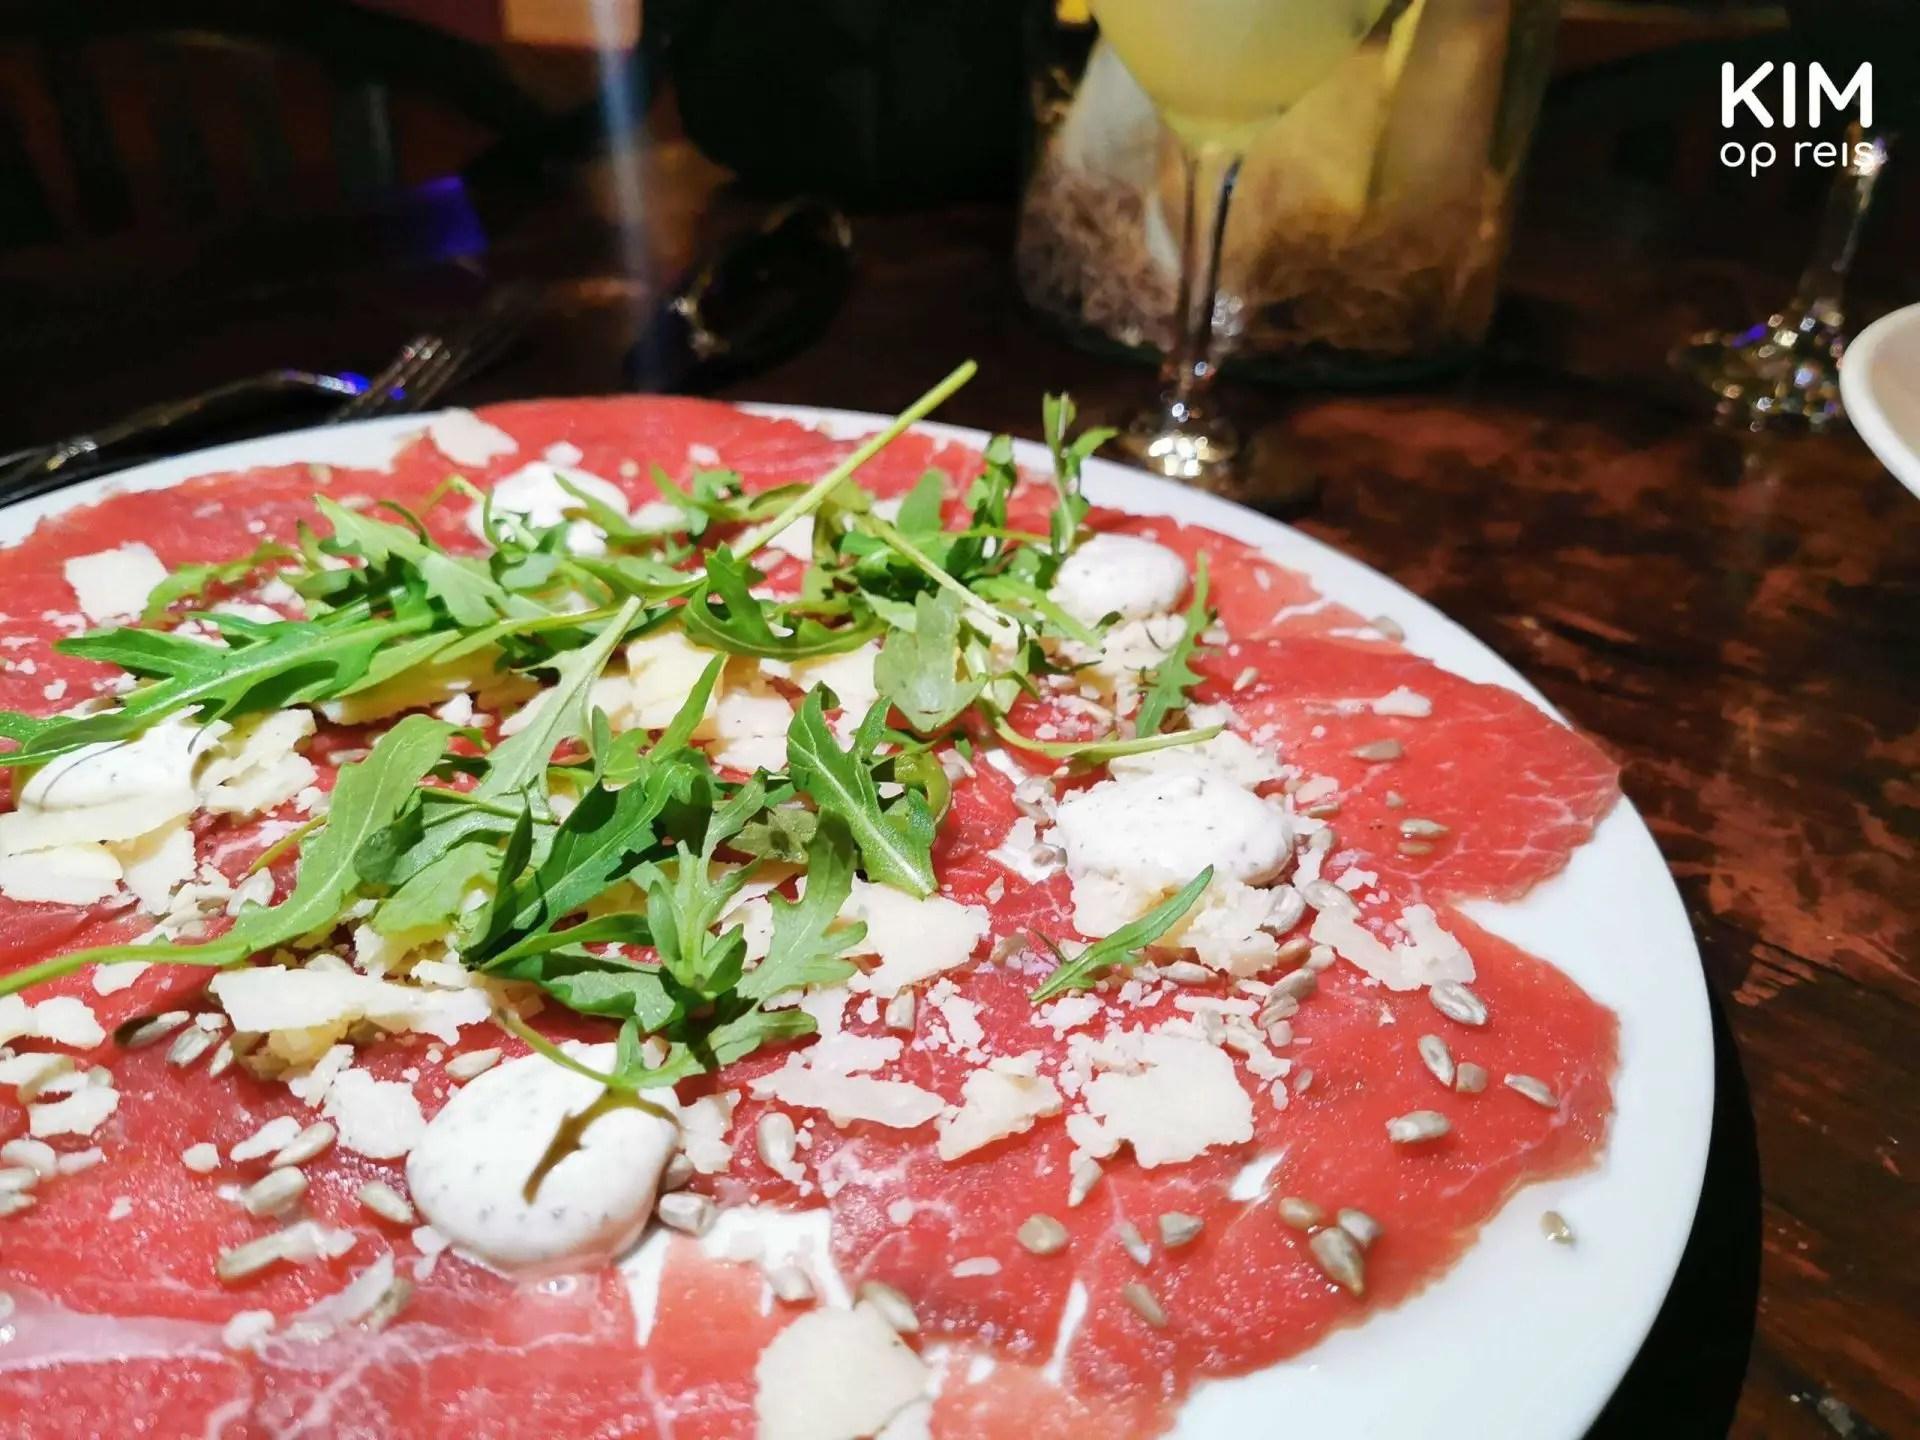 Carpaccio de Gouverneur Curaçao: plate with carpaccio with cheese and salad